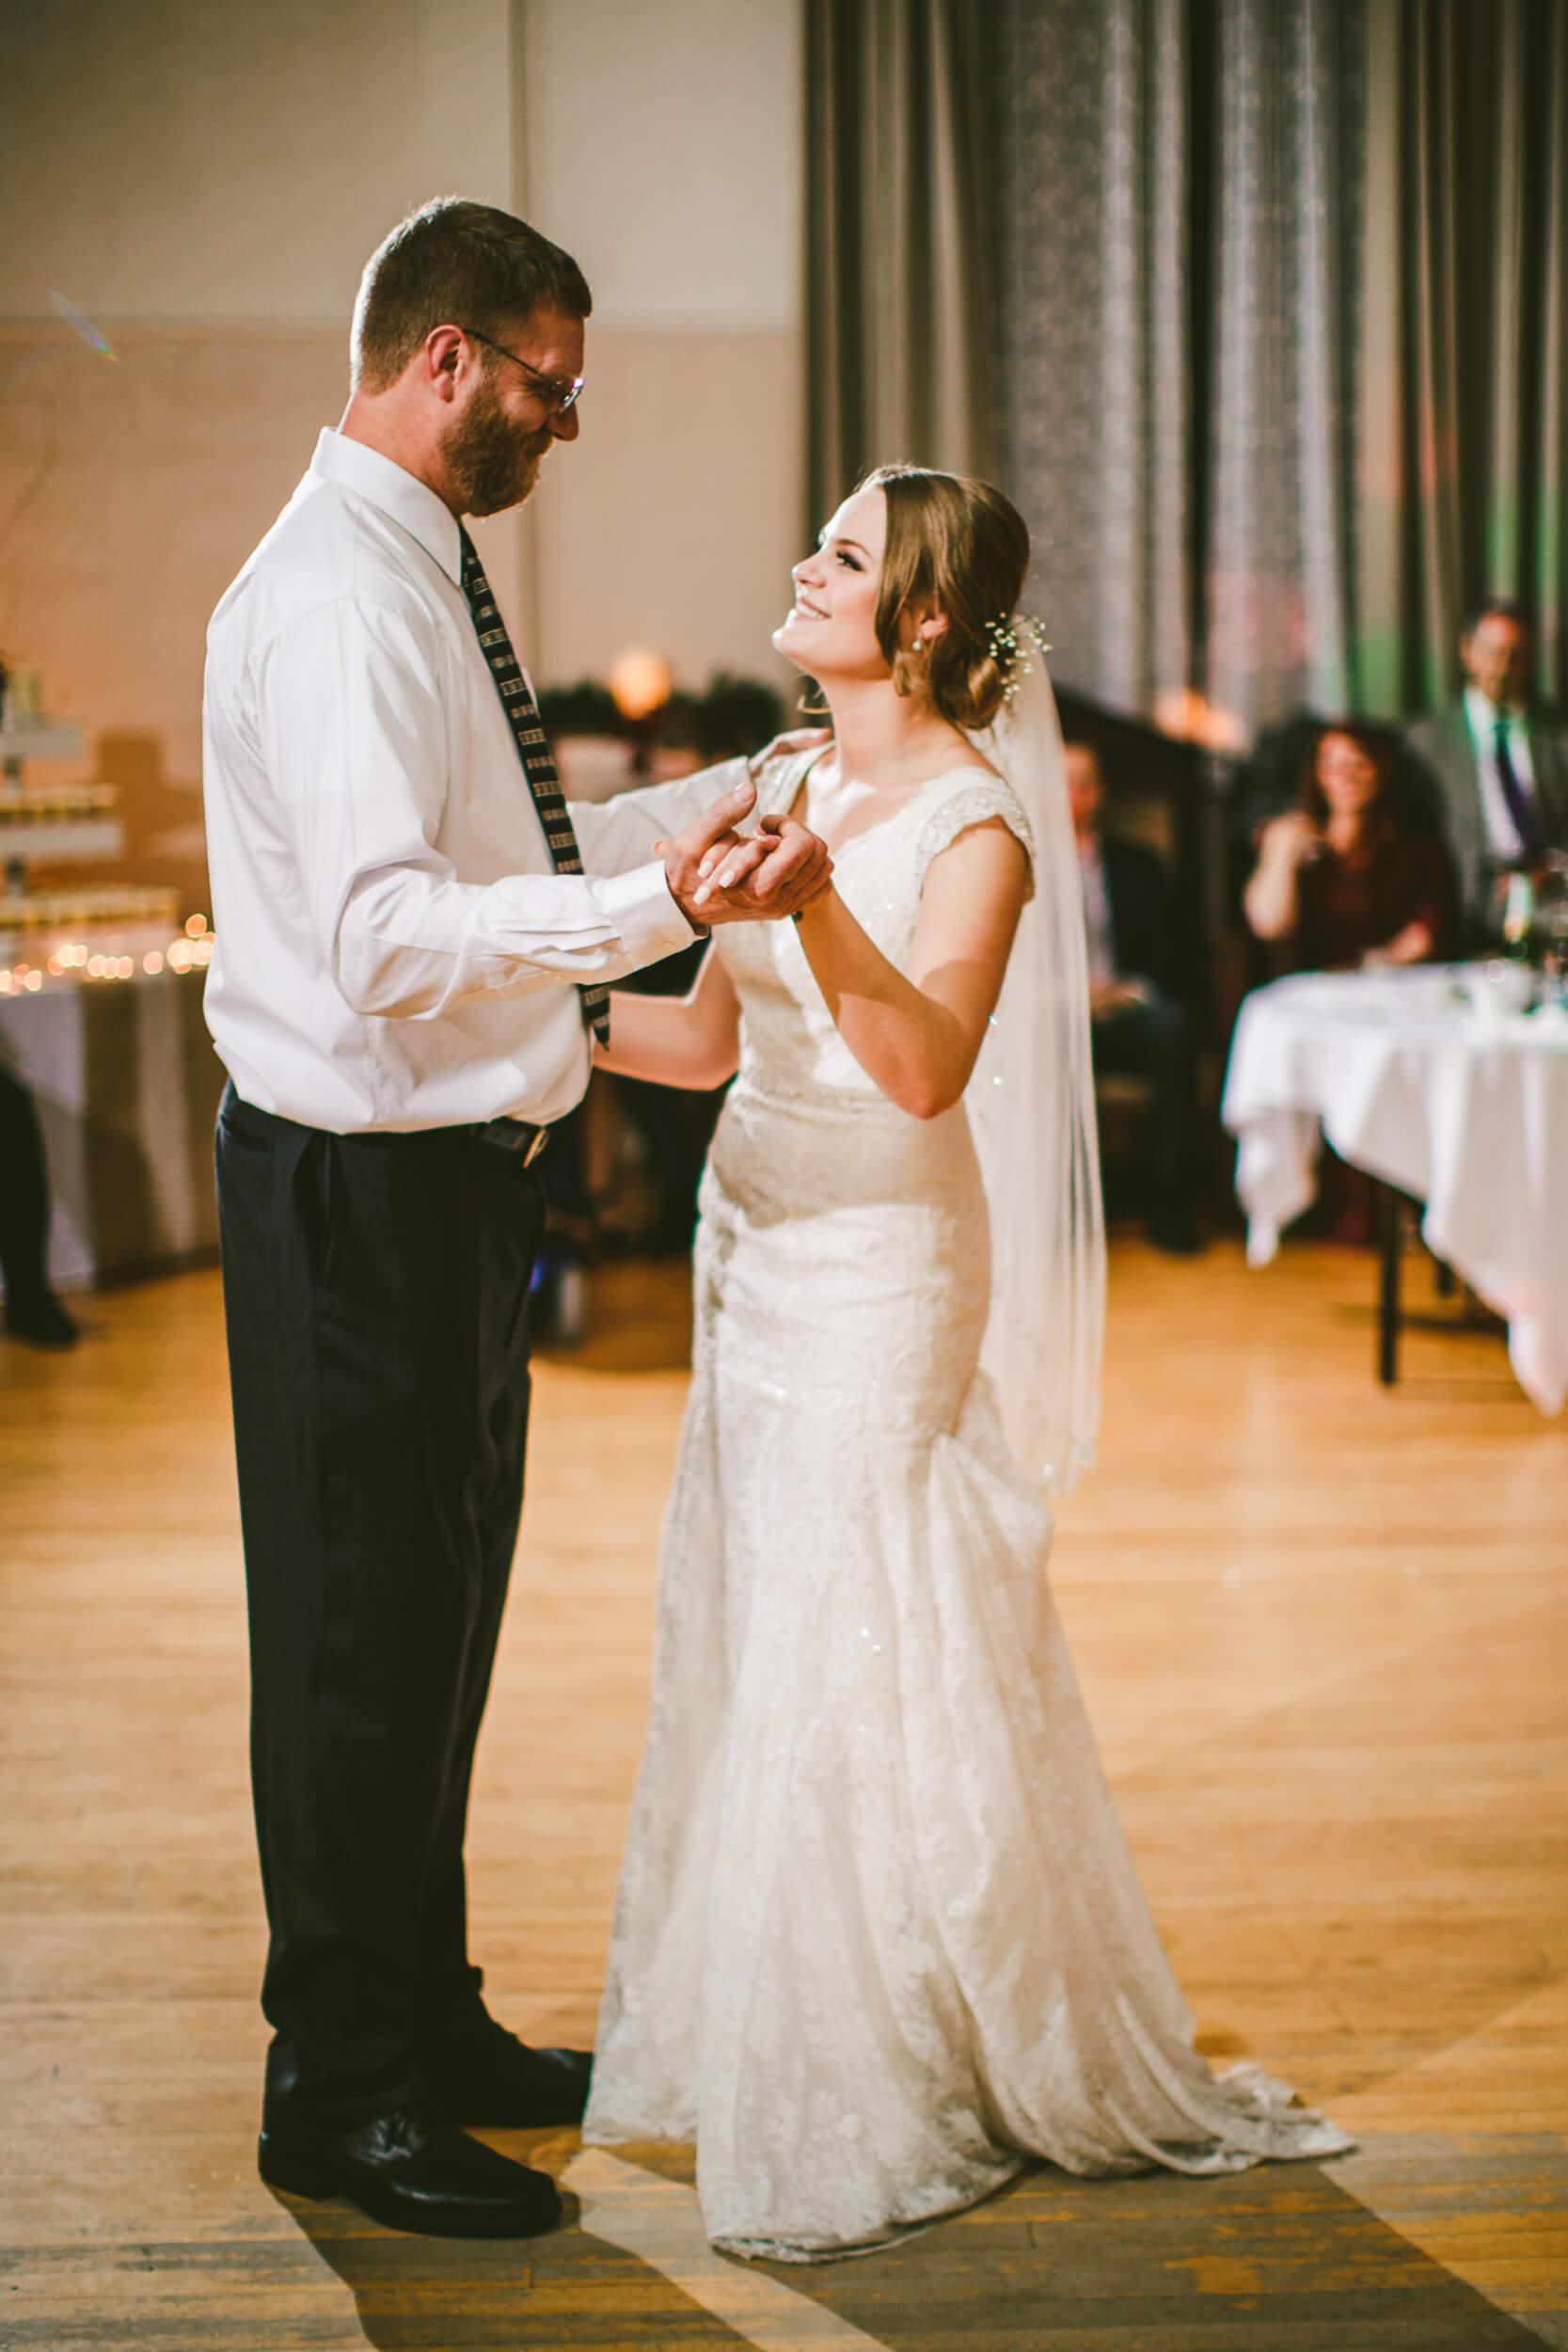 mukogawa winter wedding in spokane (291).jpg